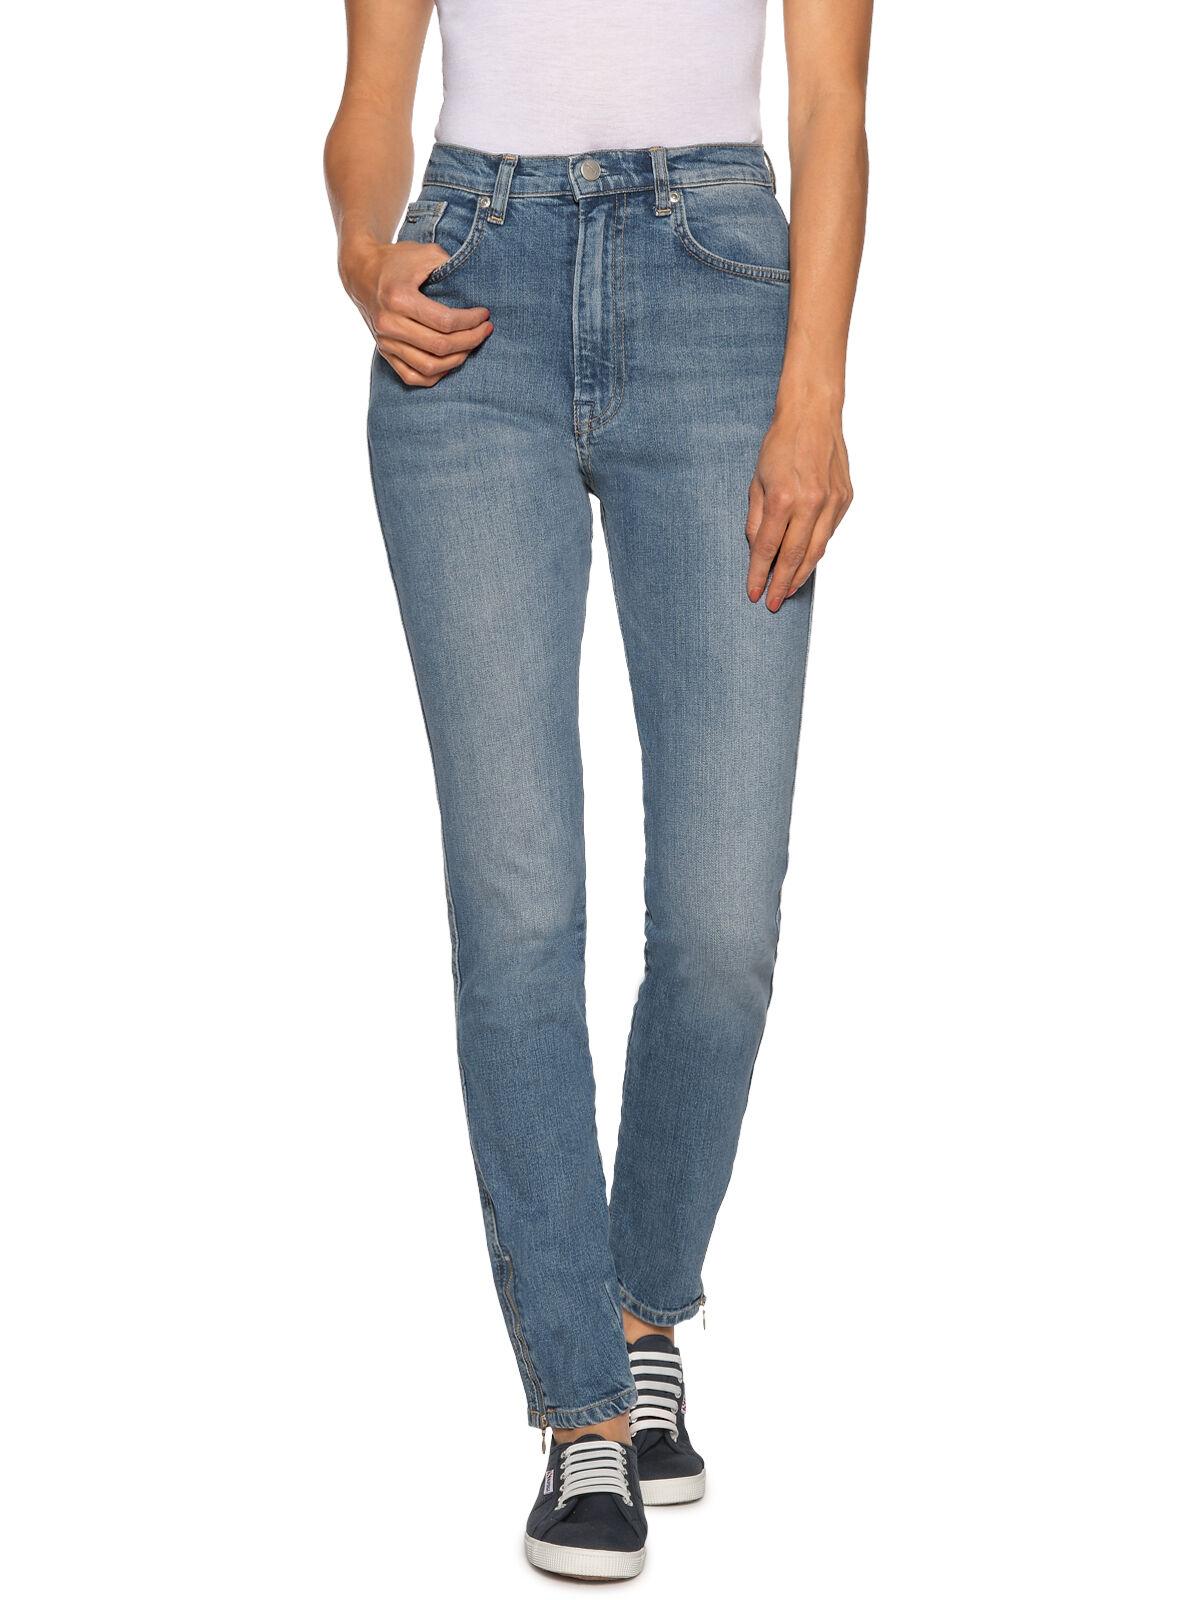 Gladis Jeans